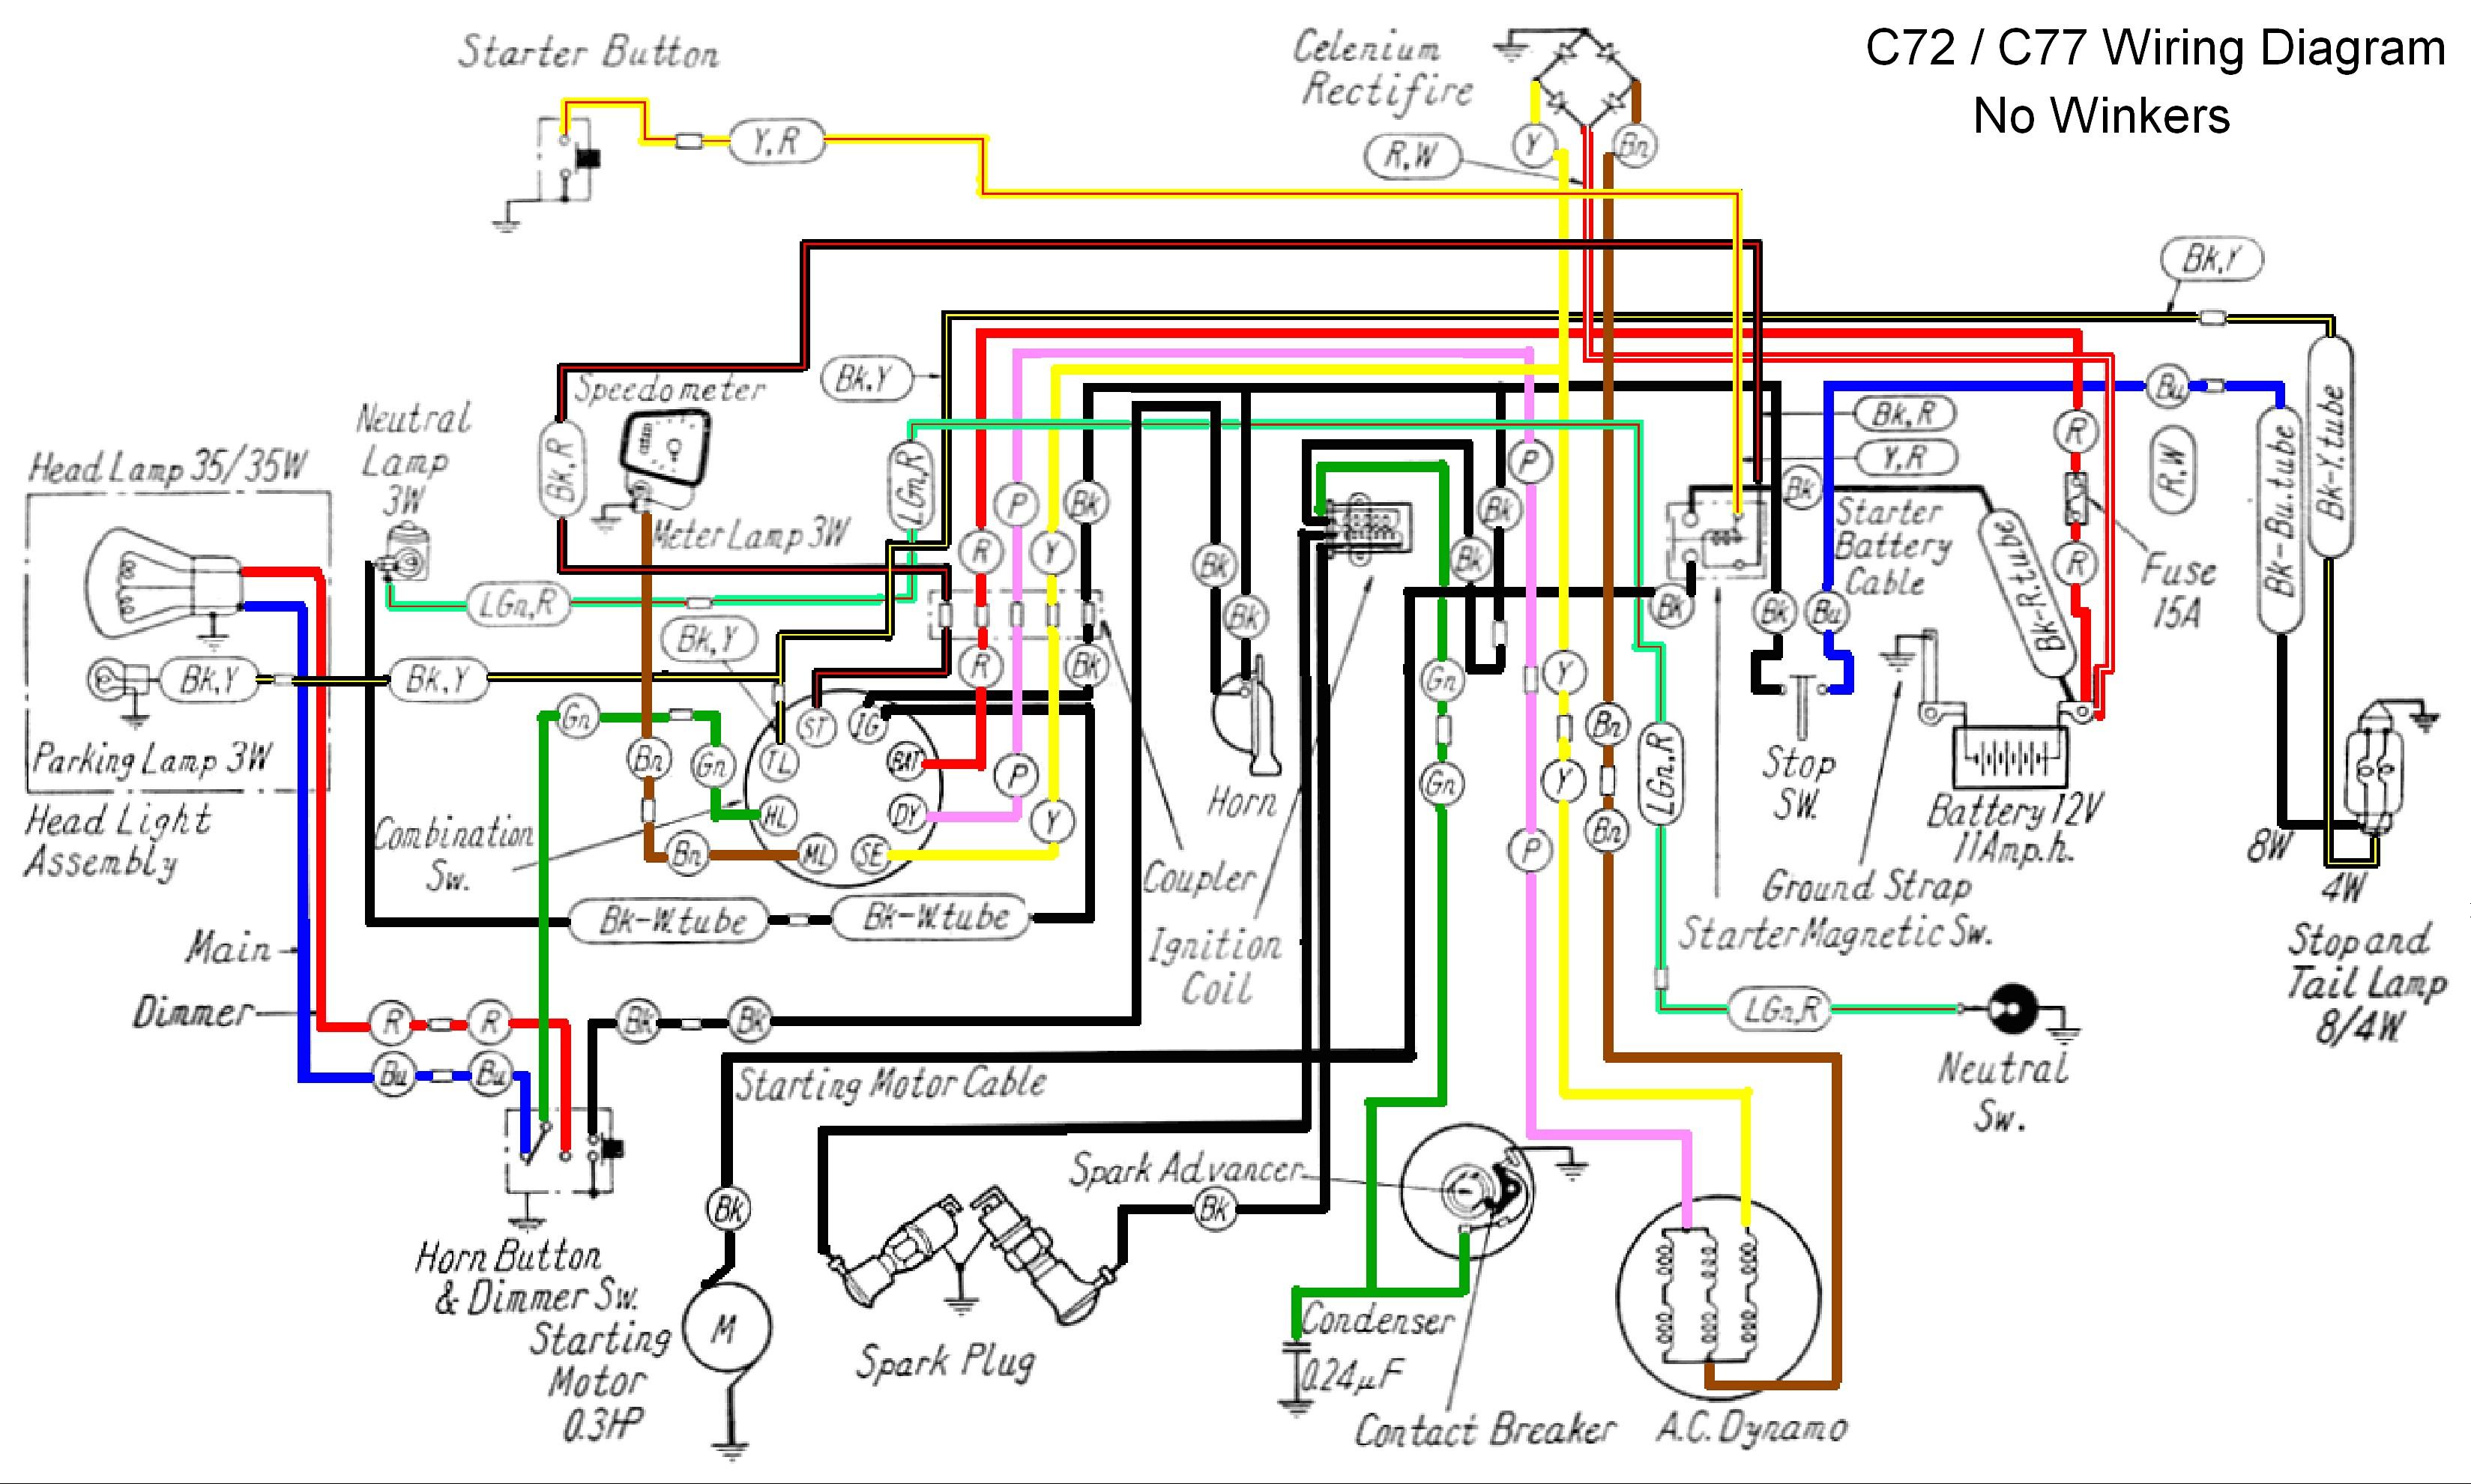 honda mr50 wiring diagram wiring data schematic u2022 rh masterlimobc com  Vintage 1974 Honda 2 Stroke MR50 Craigslist Honda MR50